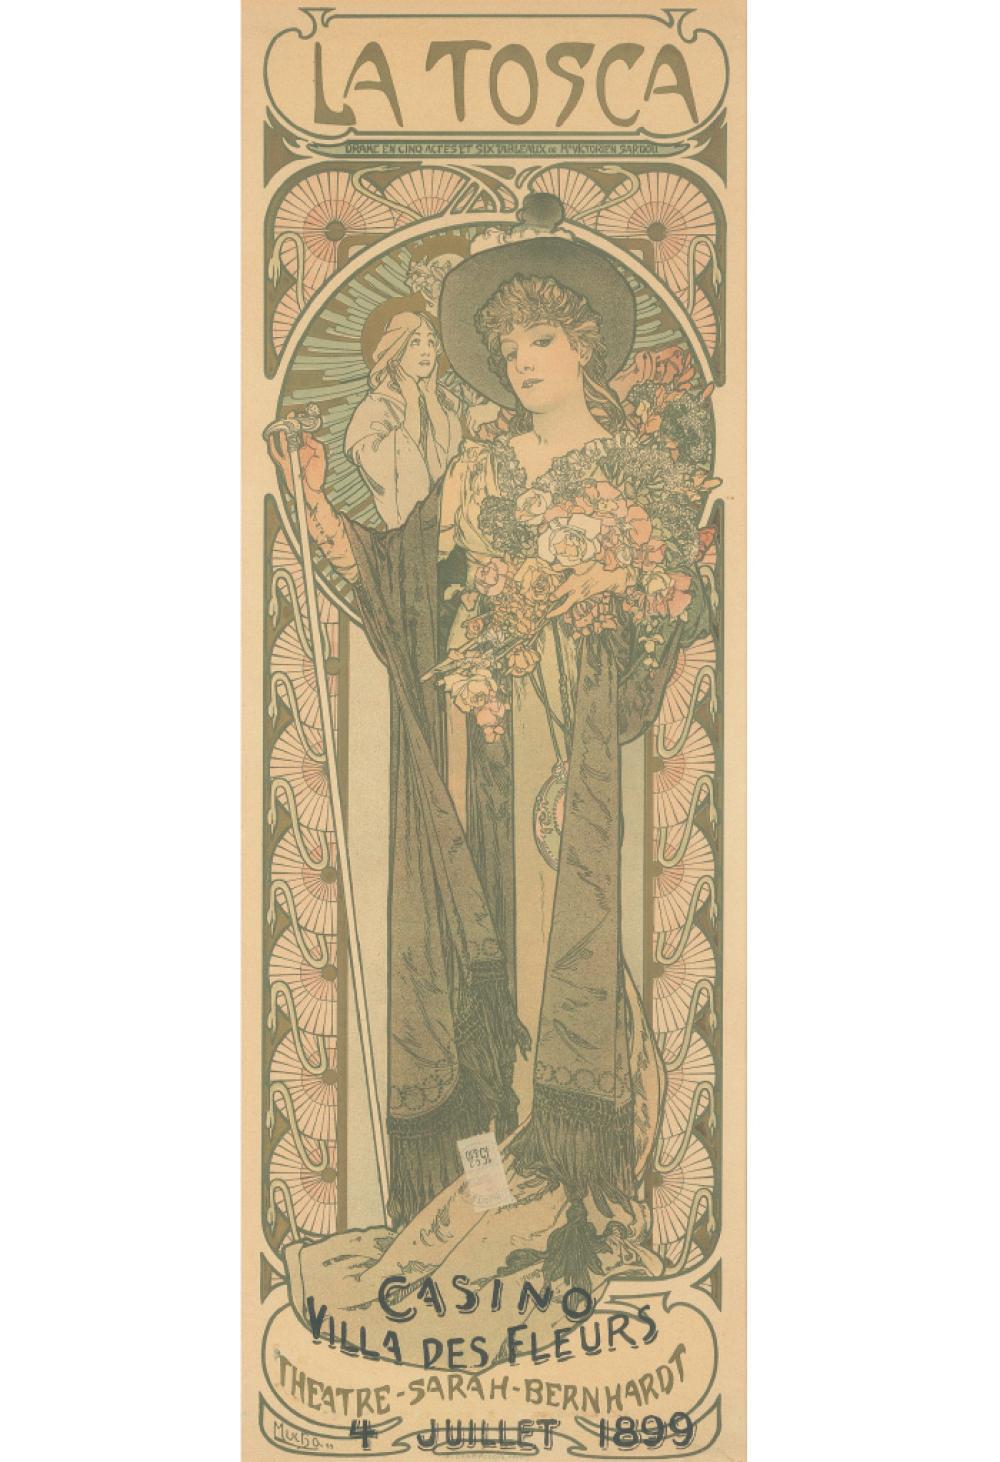 ALPHONSE MUCHA (1860-1939). LA TOSCA. 1898. 40x13 inches, 101x35 cm. F. Champenois, Paris.